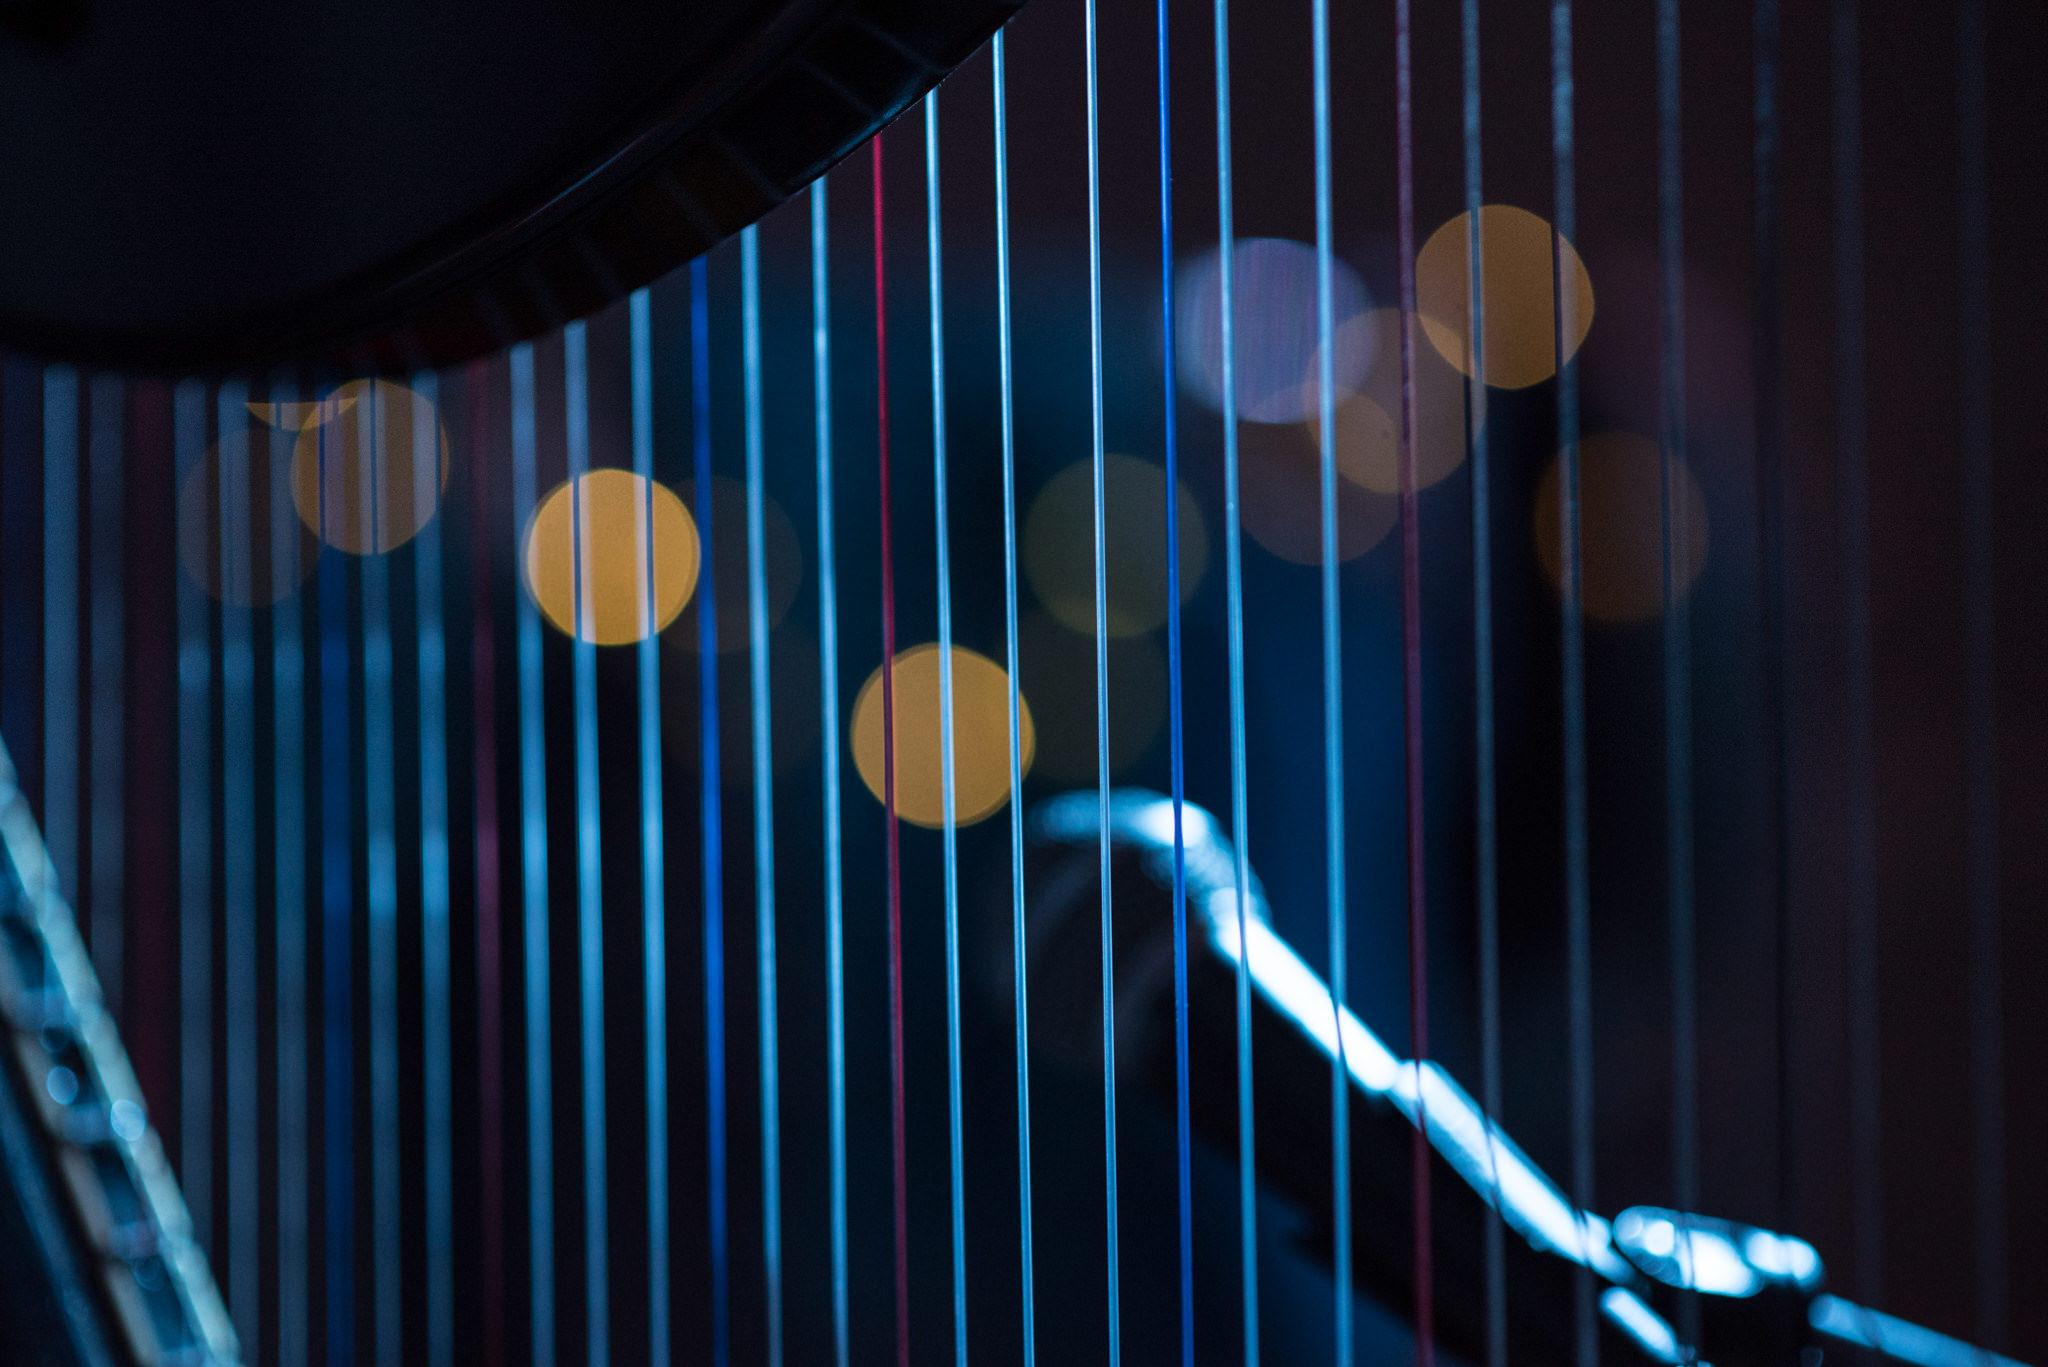 katherine-harrison-harp-live.jpg